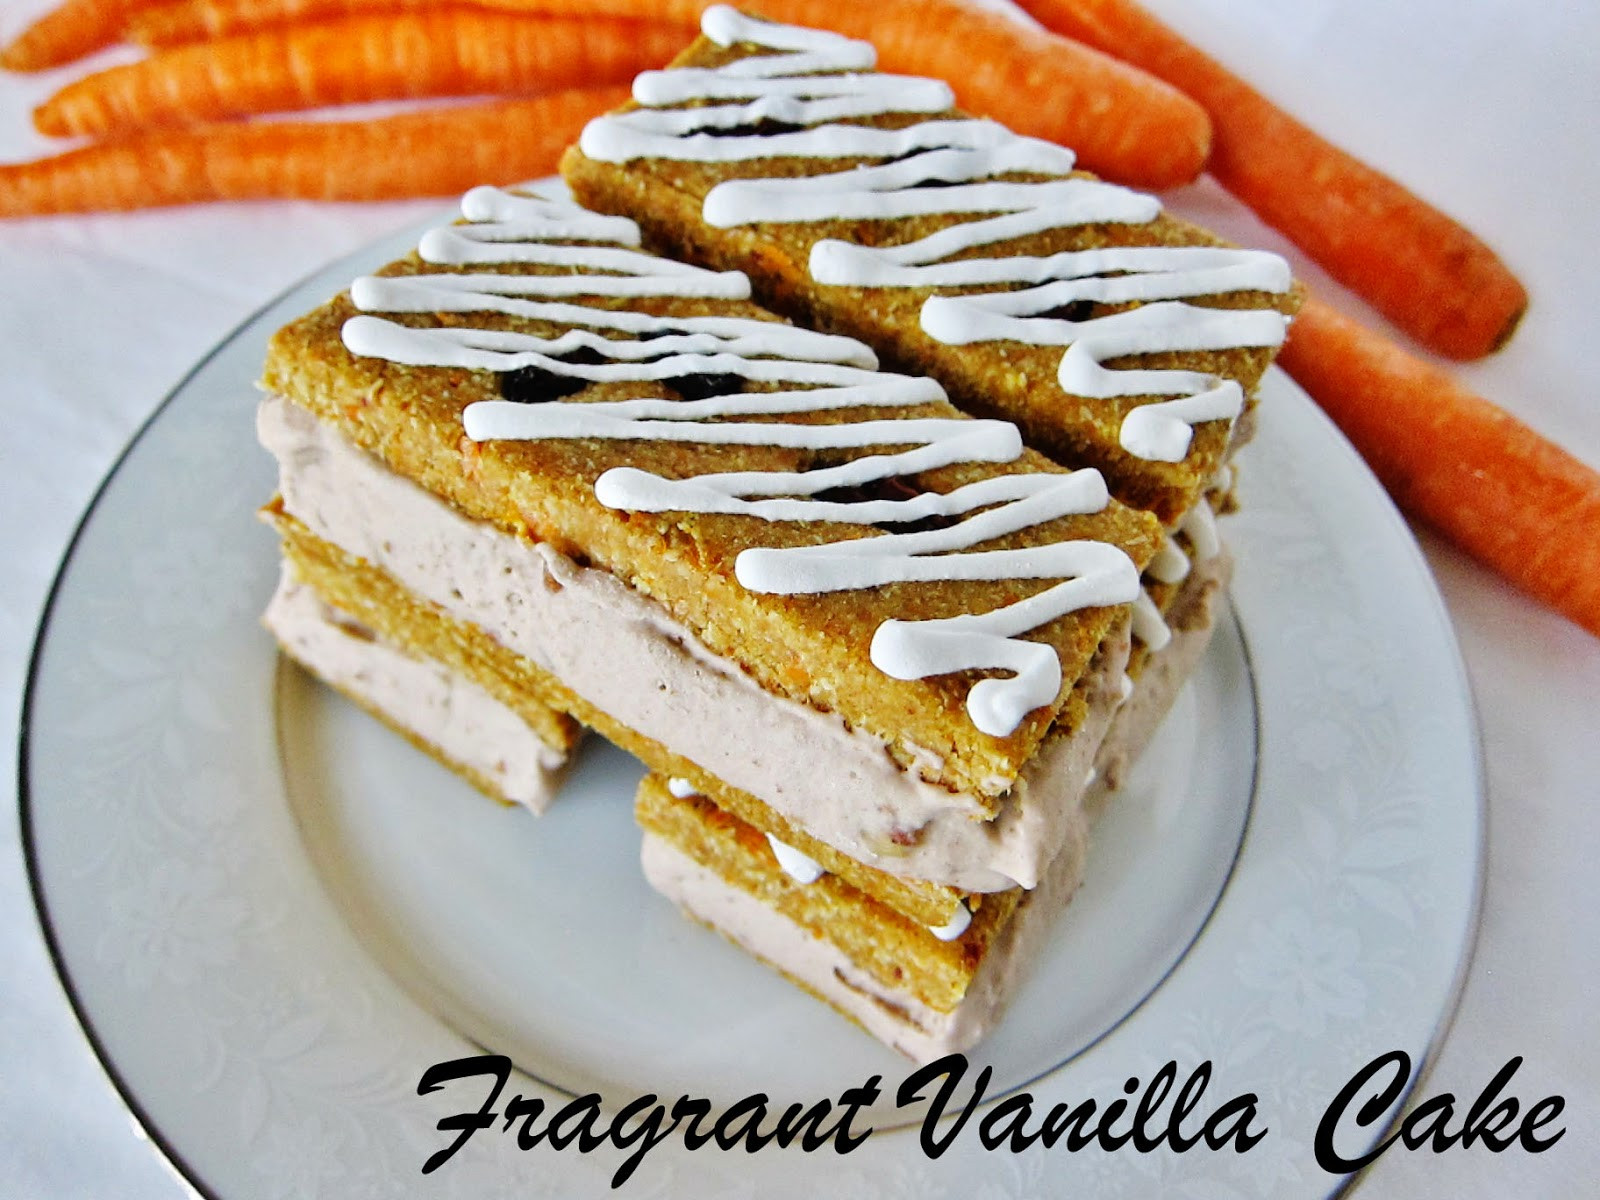 Raw Carrot Cake Ice Cream Sandwiches with Caramel Pecan Ice Cream